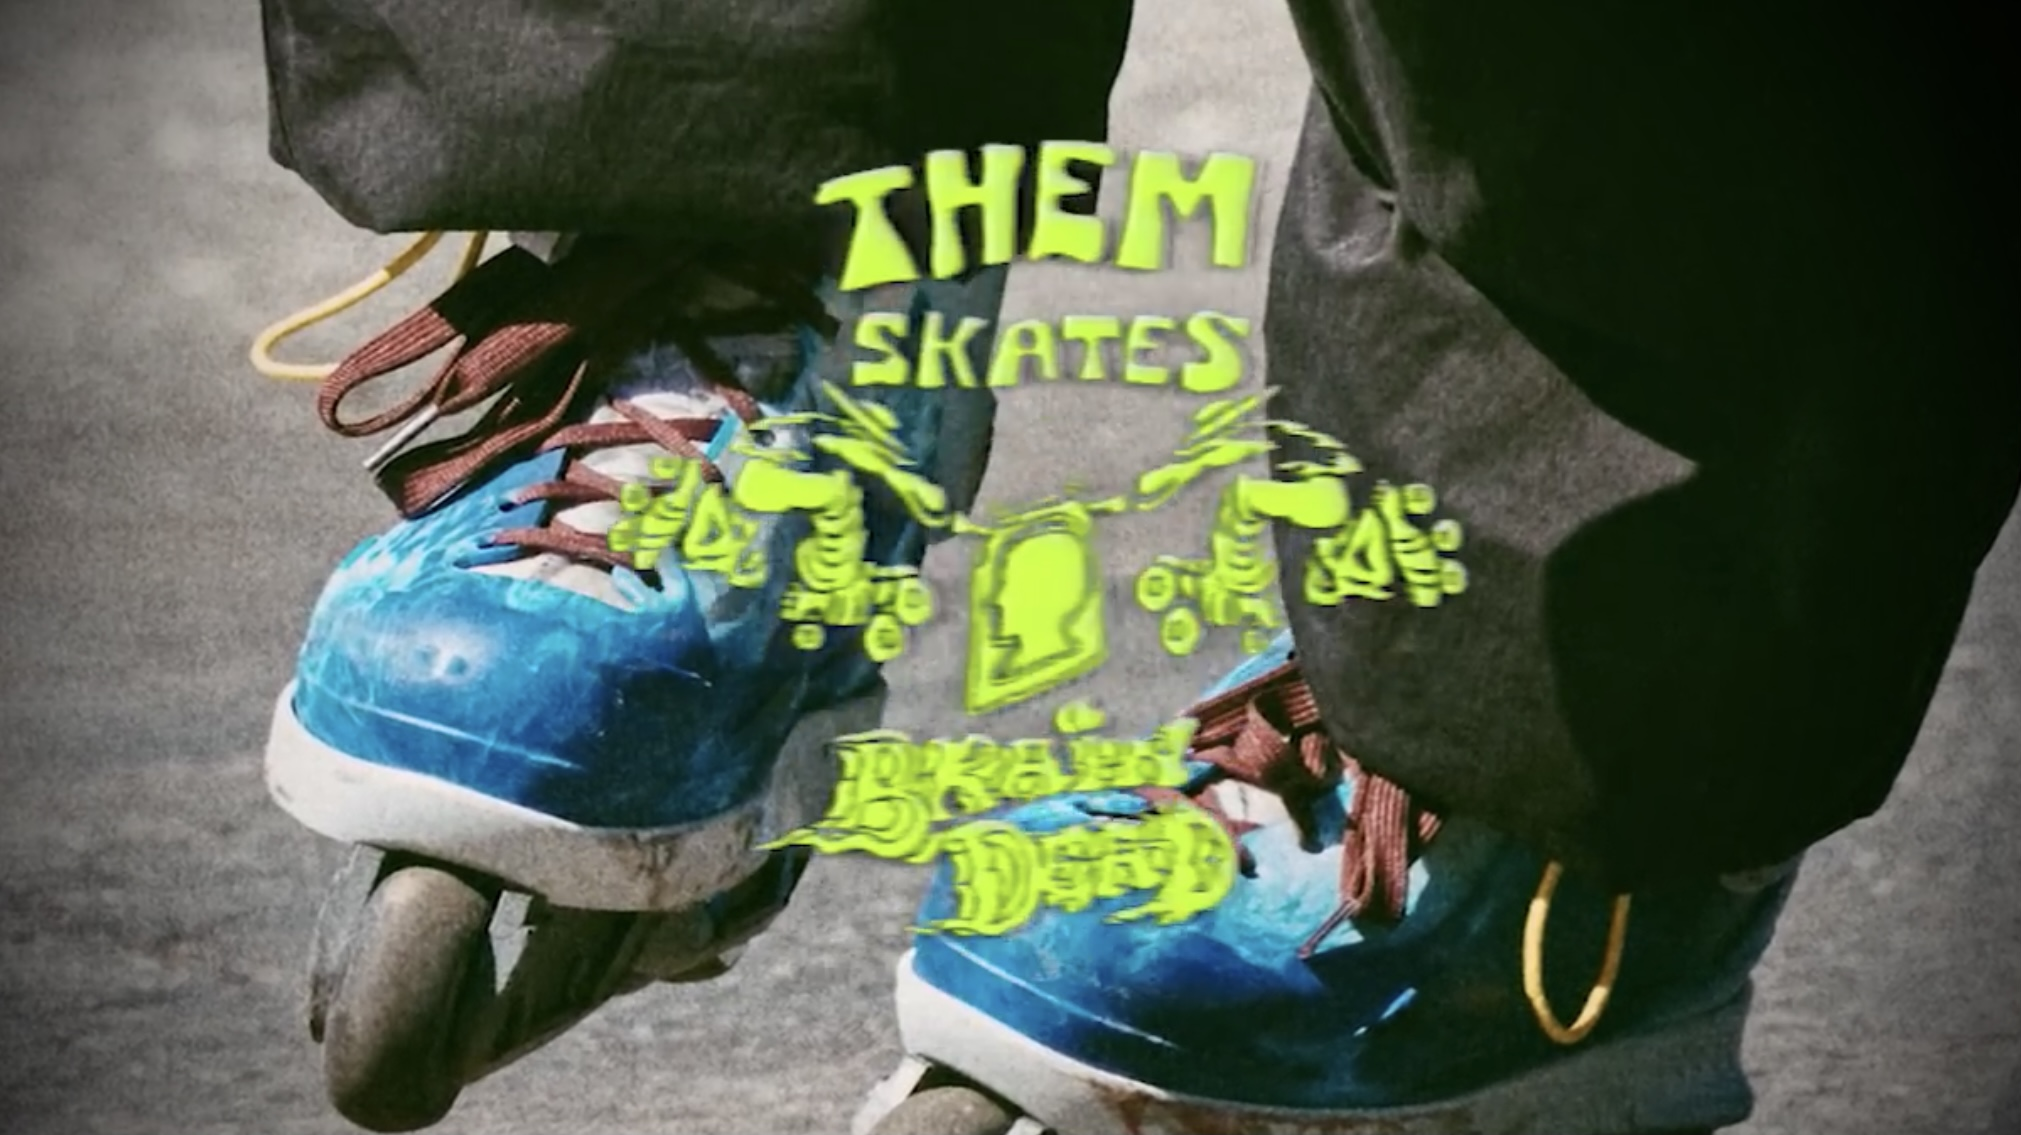 """Future Shred Technology"" by THEM Skates"